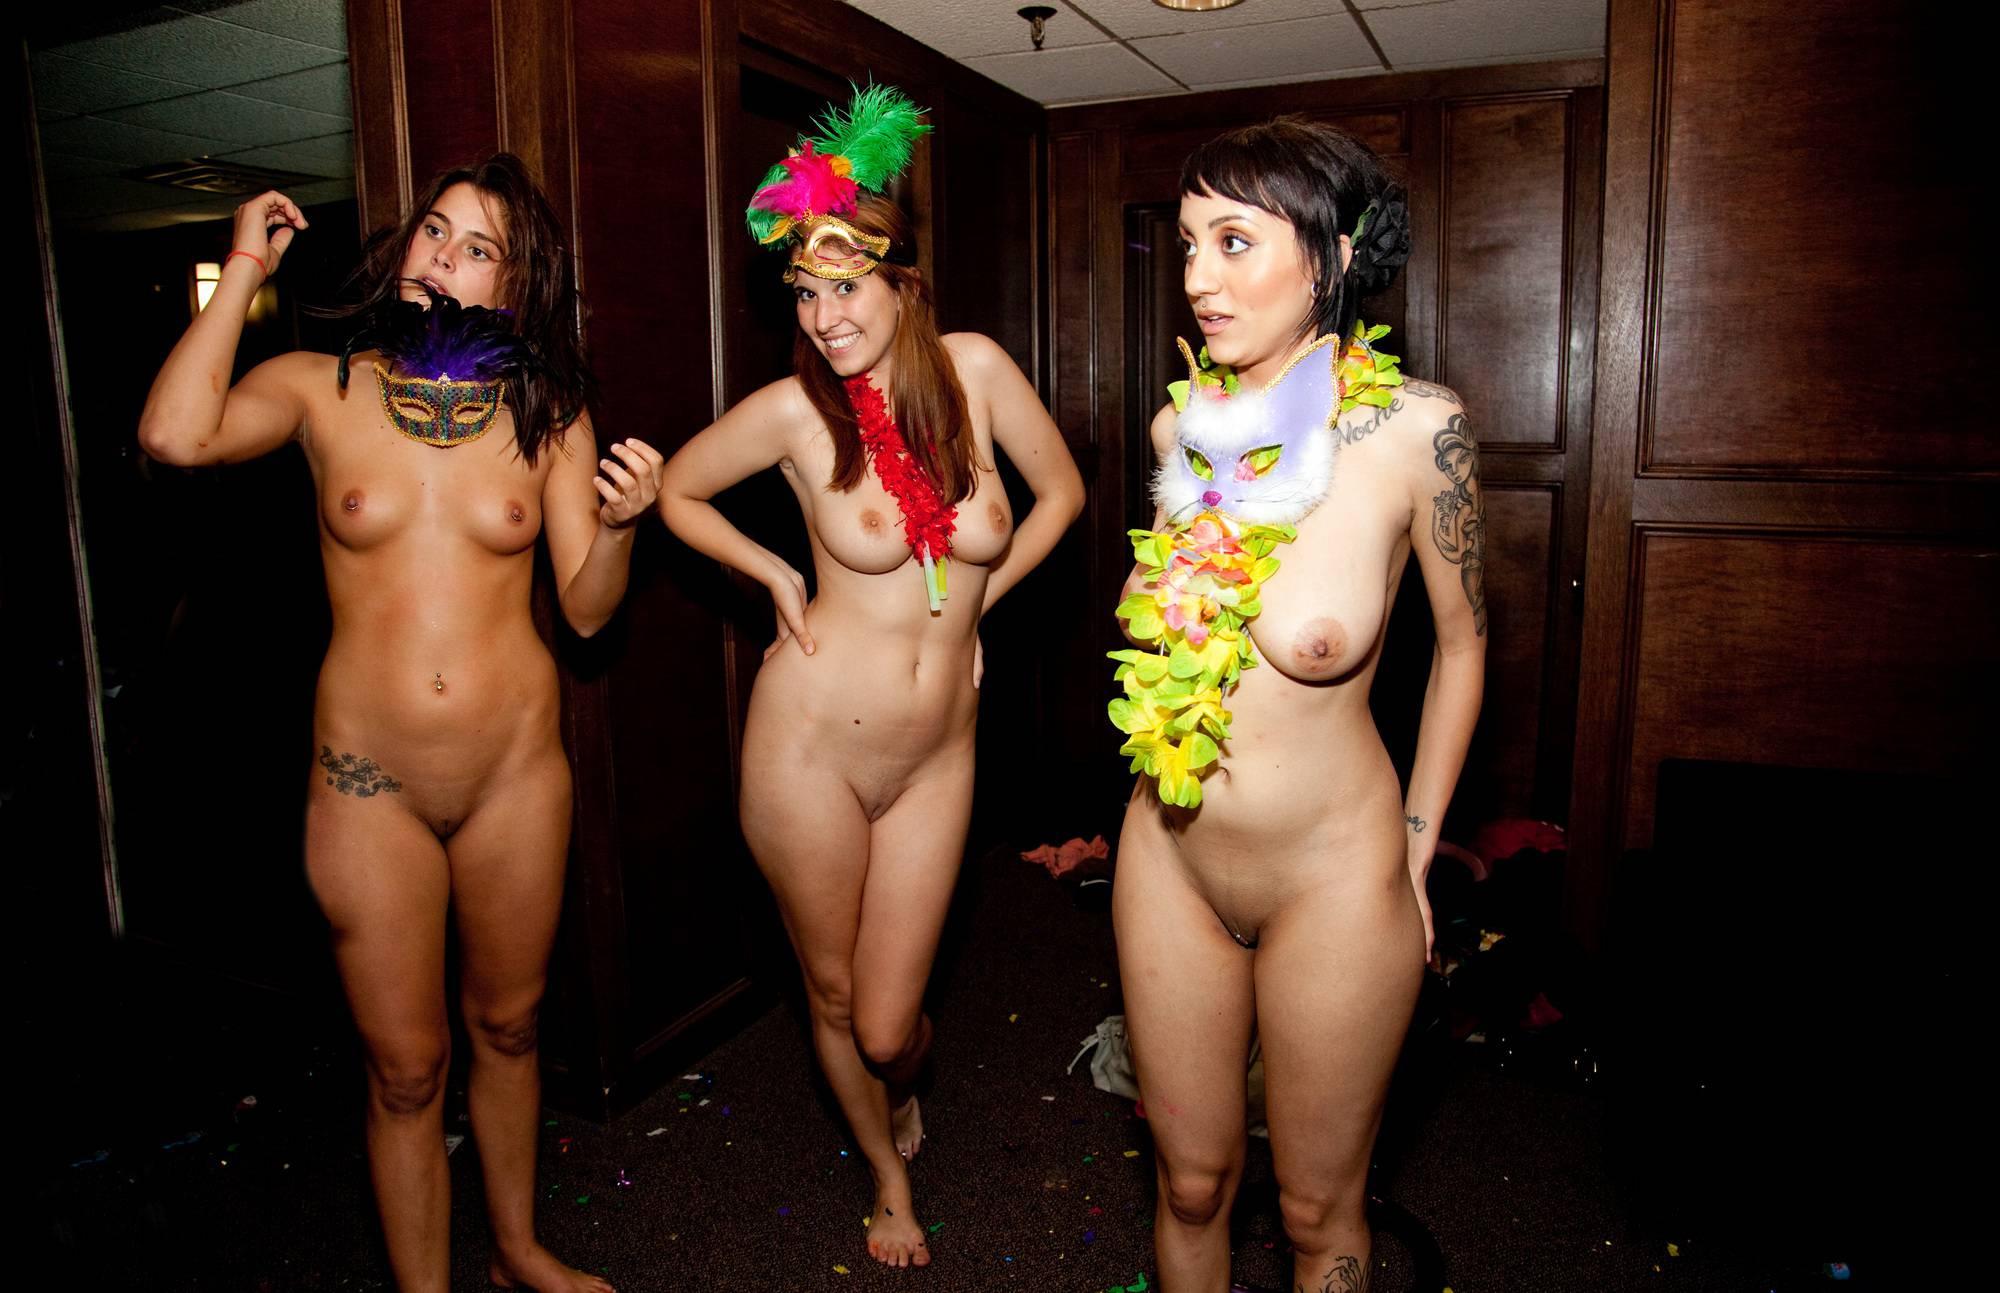 Masquerade Hallway Fun - 3